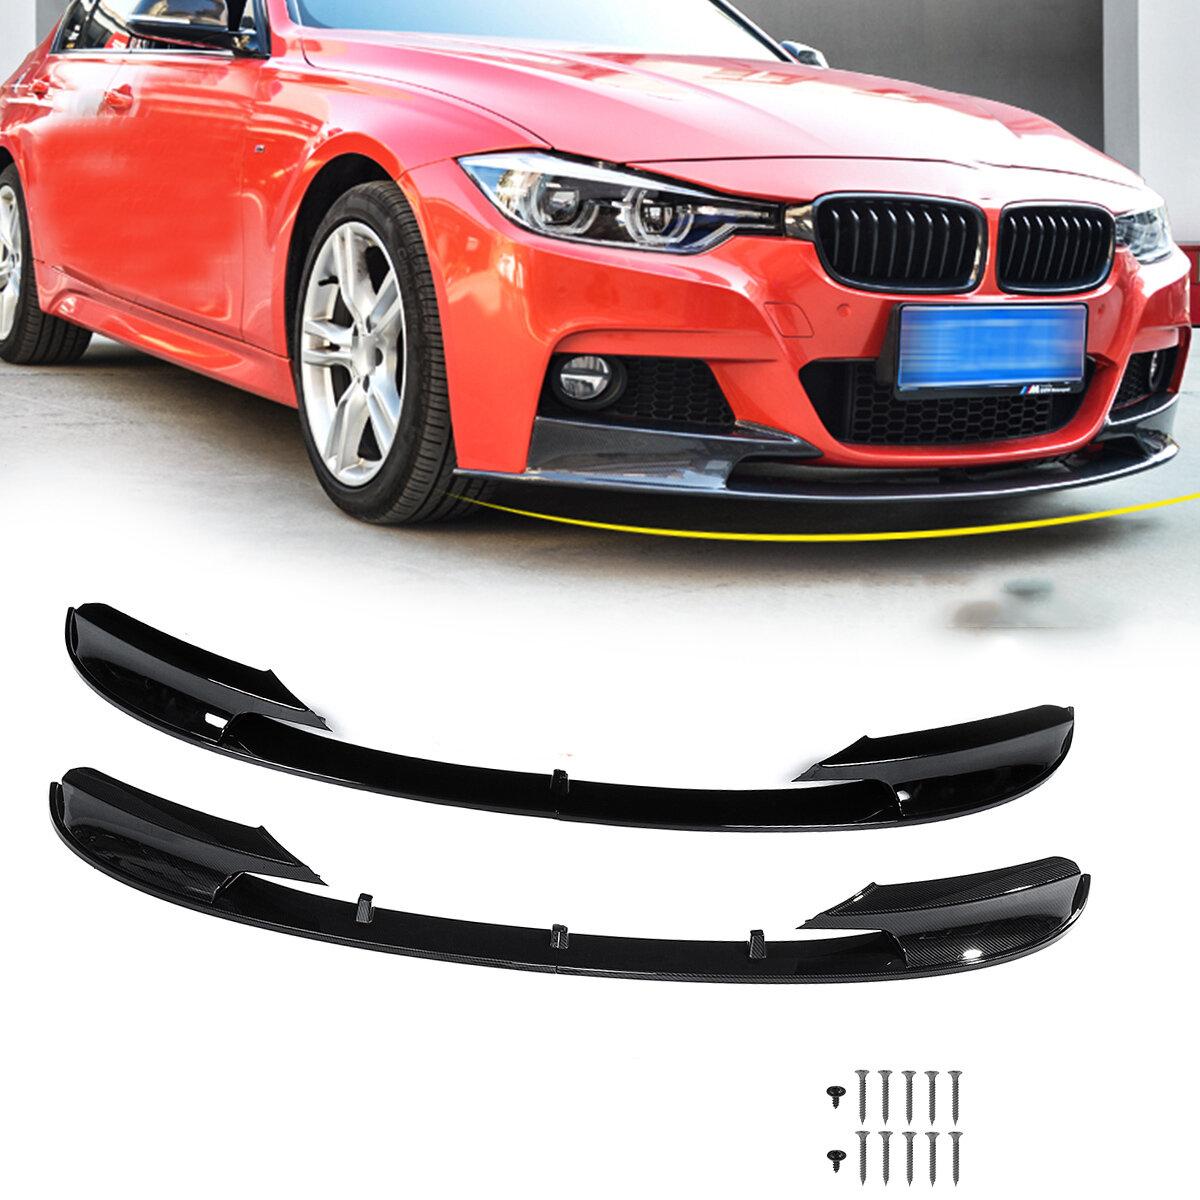 Carbon Fiber Splitter Front Bumper Lip For BMW F30 Sedan M Tech Sport 2012-2018